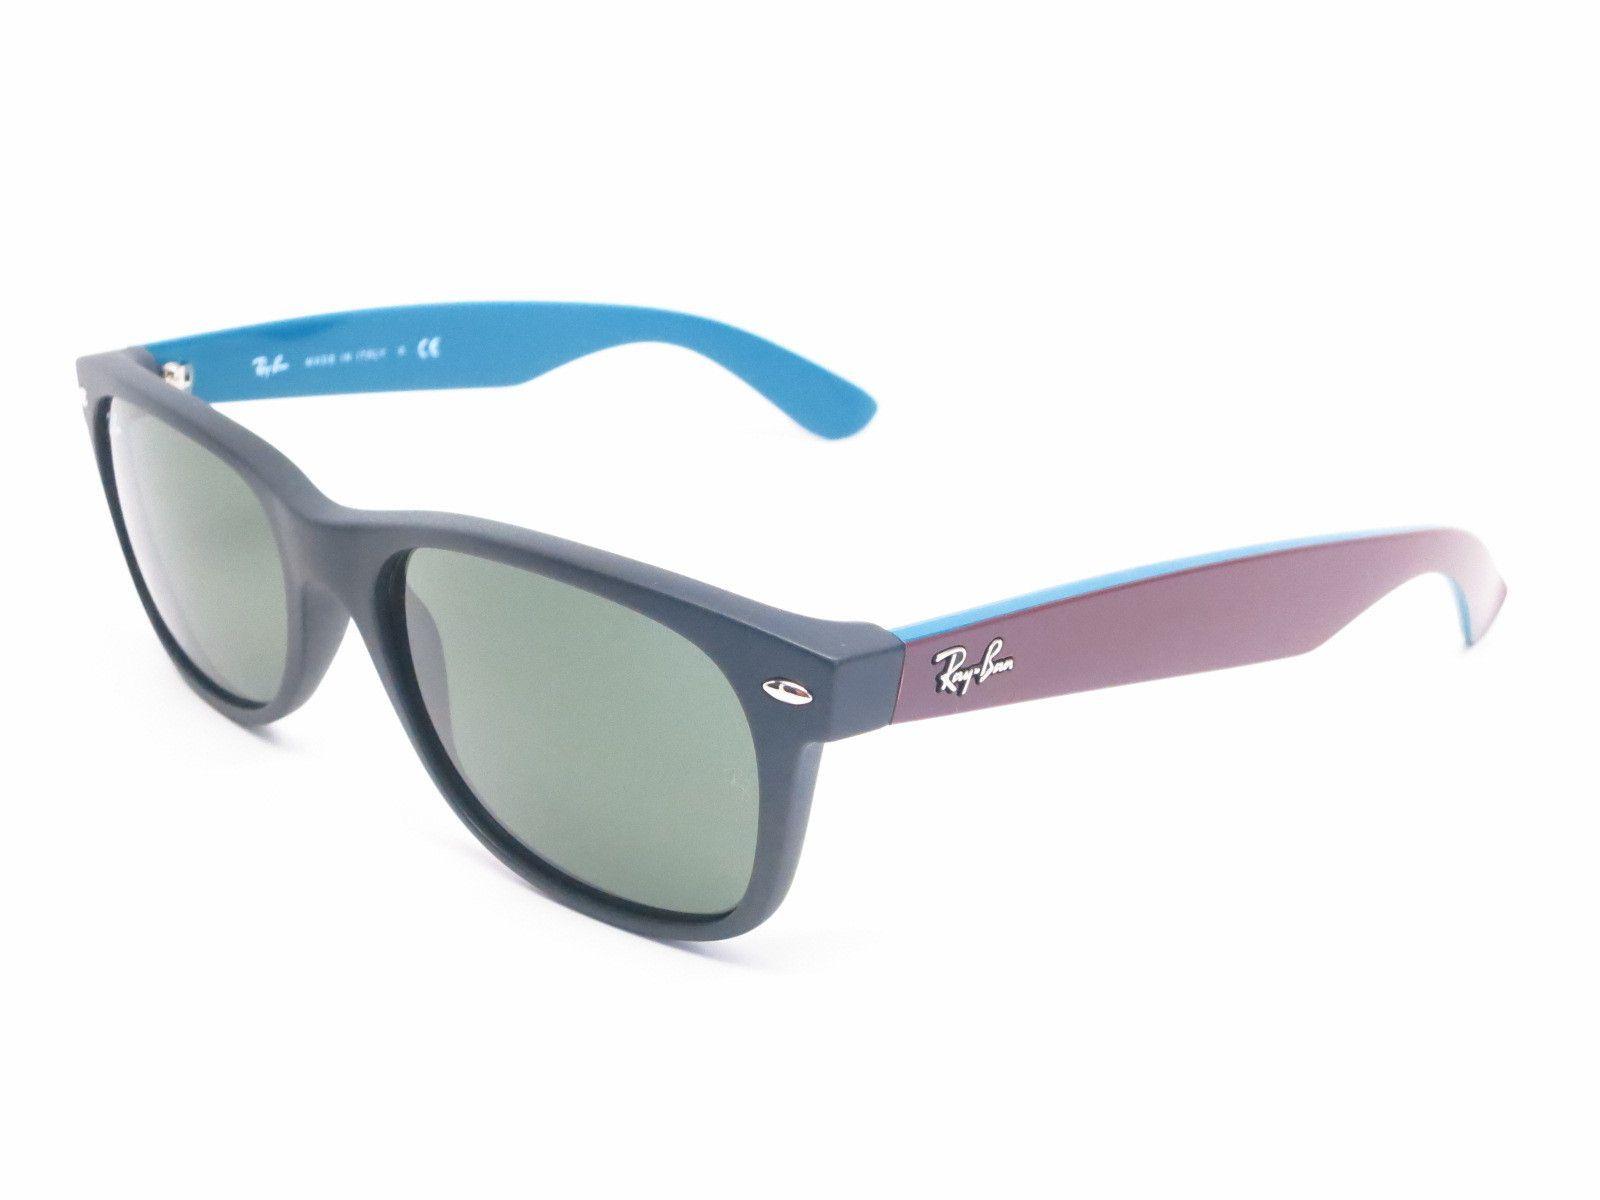 ca02133839 Ray-Ban RB 2132 New Wayfarer 6182 Matte Black Sunglasses